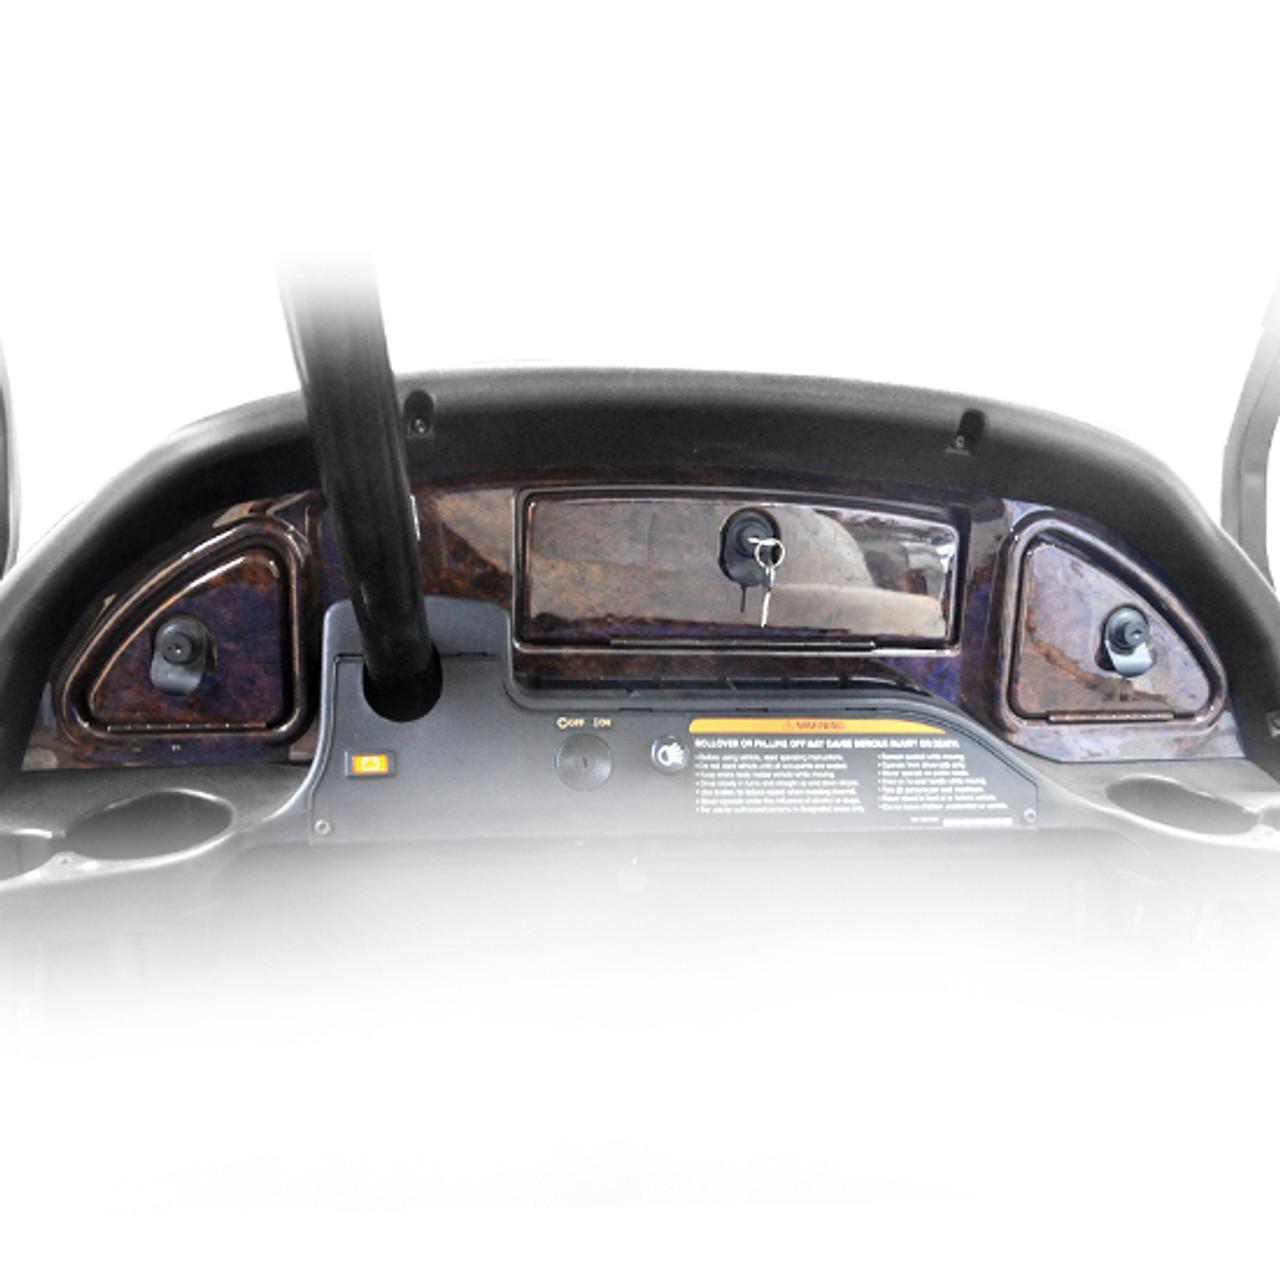 Madjax 08+ Wood grain dash fit Club Car Precedent